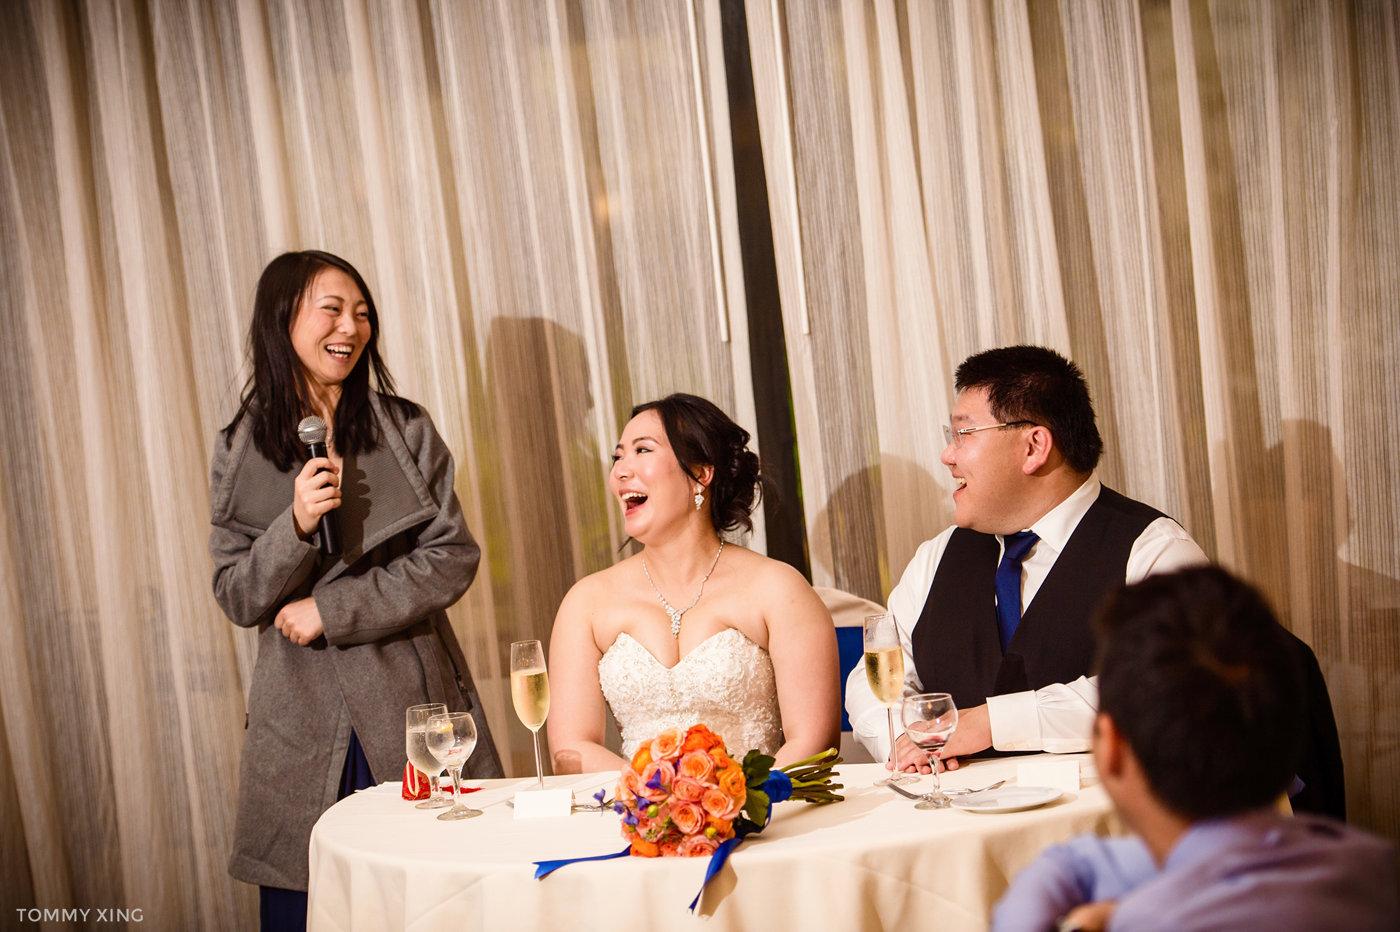 STANFORD MEMORIAL CHURCH WEDDING - Wenjie & Chengcheng - SAN FRANCISCO BAY AREA 斯坦福教堂婚礼跟拍 - 洛杉矶婚礼婚纱照摄影师 Tommy Xing Photography190.jpg